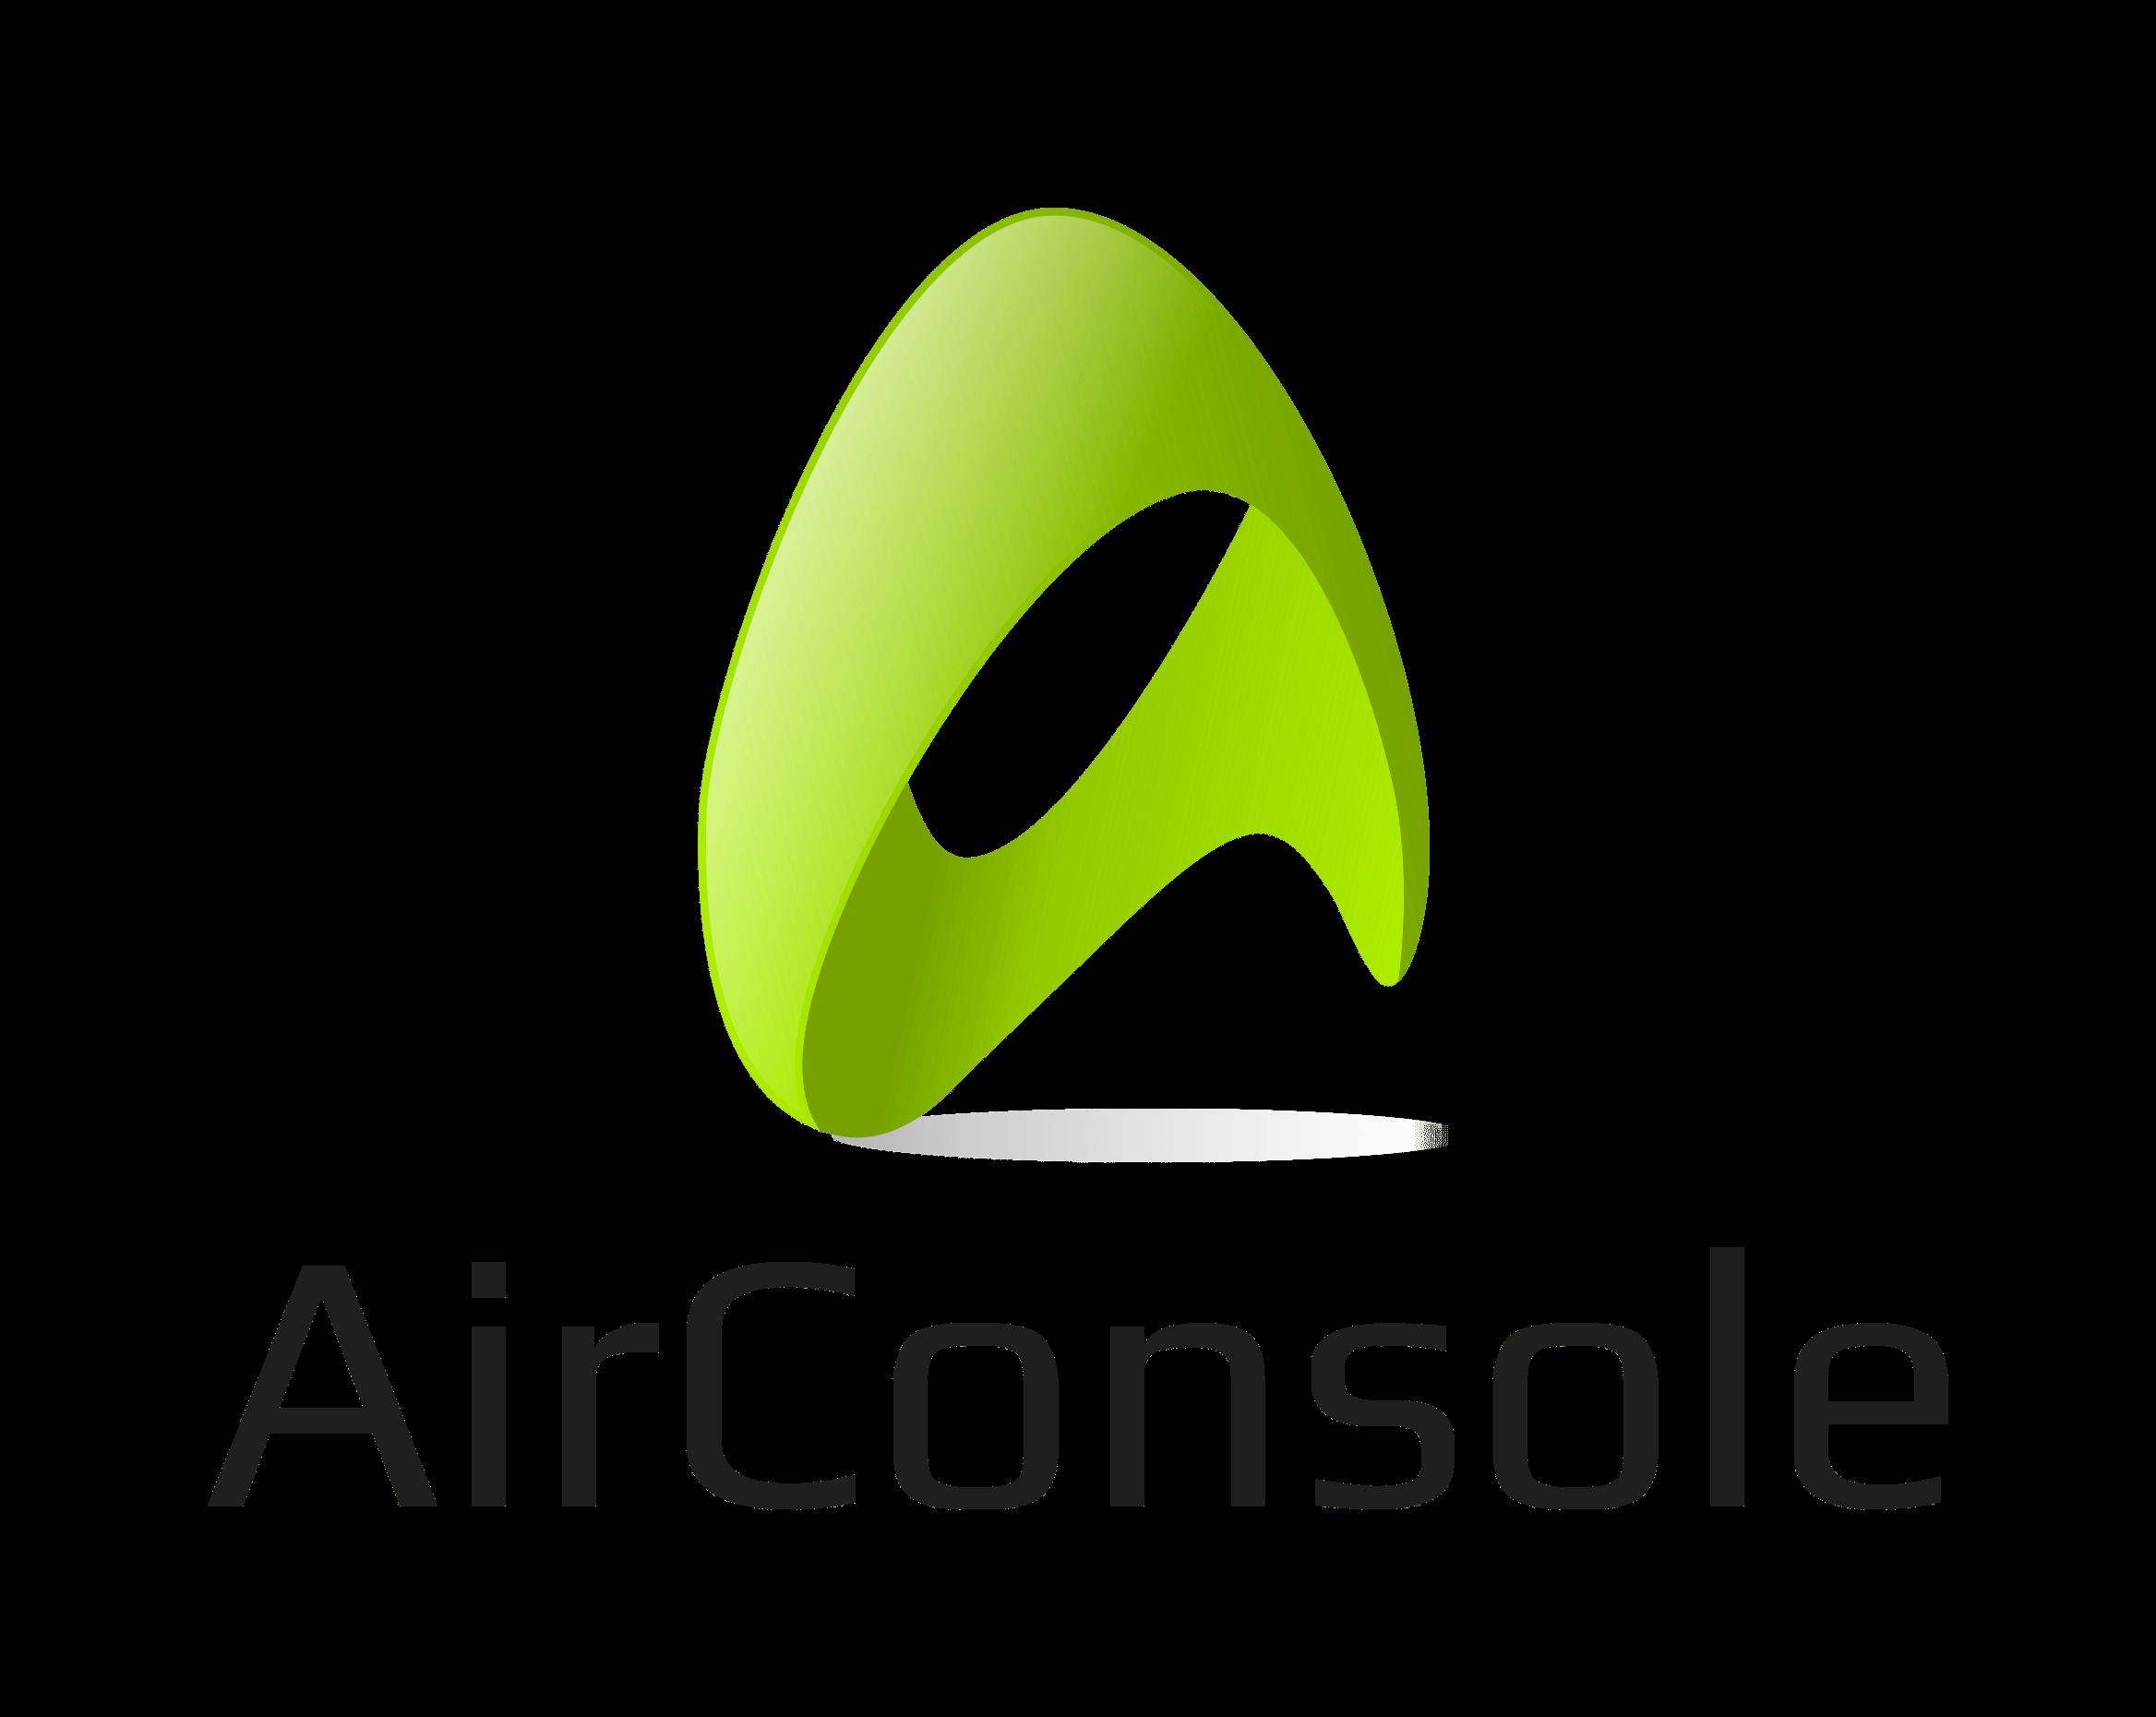 AirConsole, Zürich